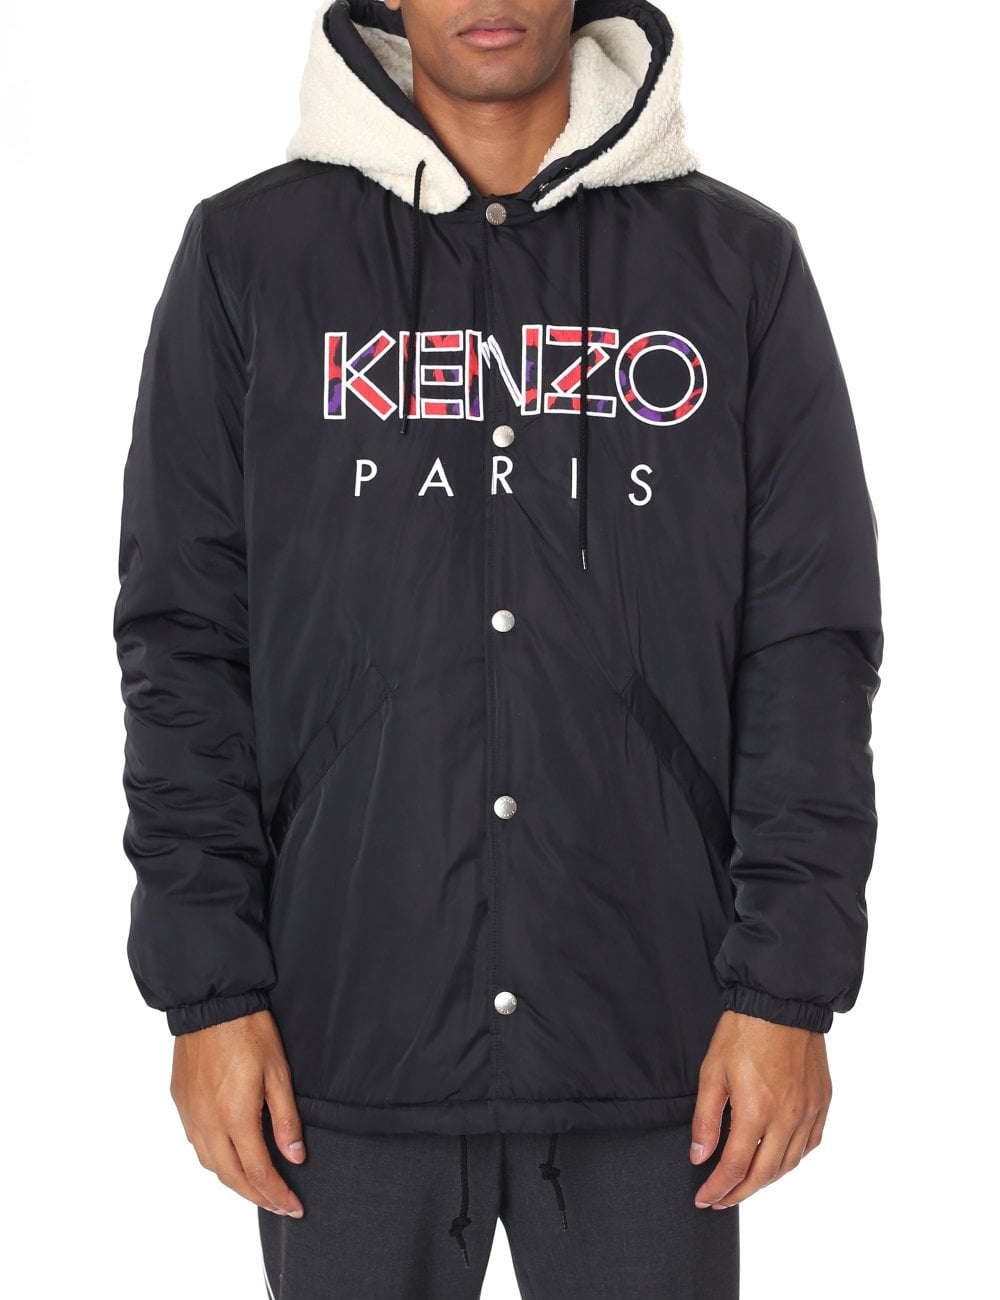 9c8a805e4 KENZO MEN'S KENZO PARIS PARKA